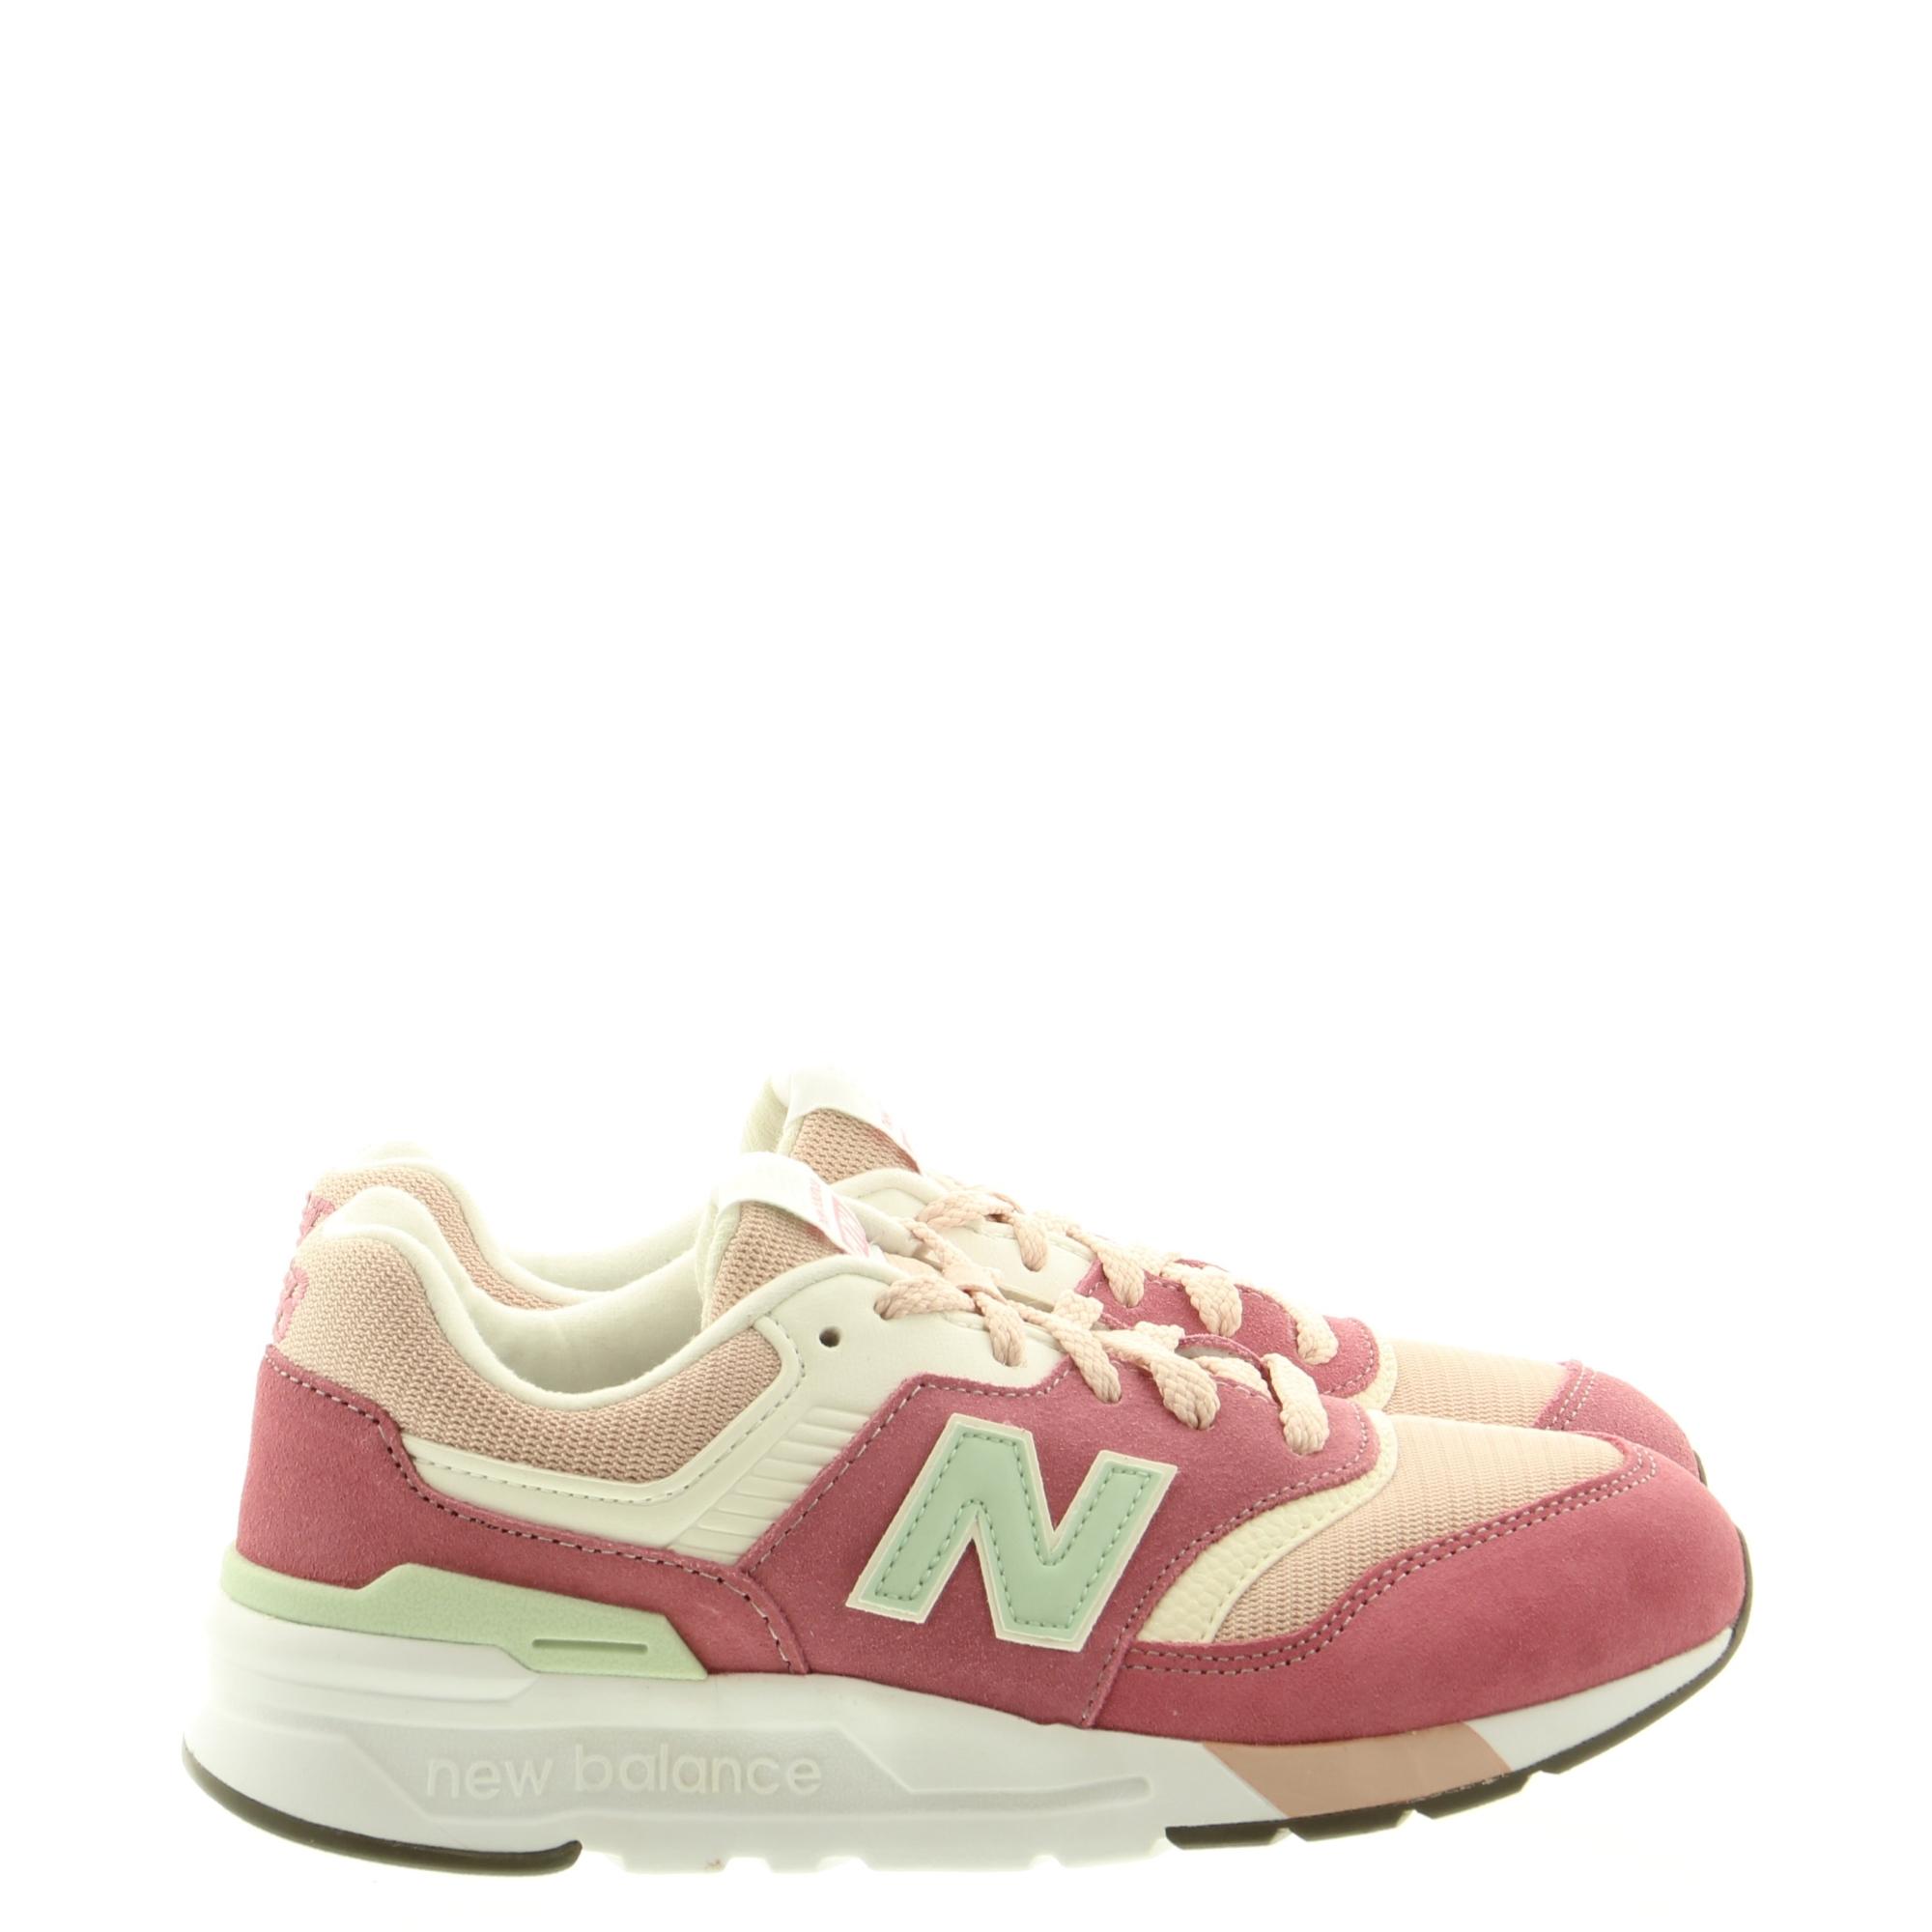 New Balance PR997 GR997 M HAP Pink 775880-775881-40-13